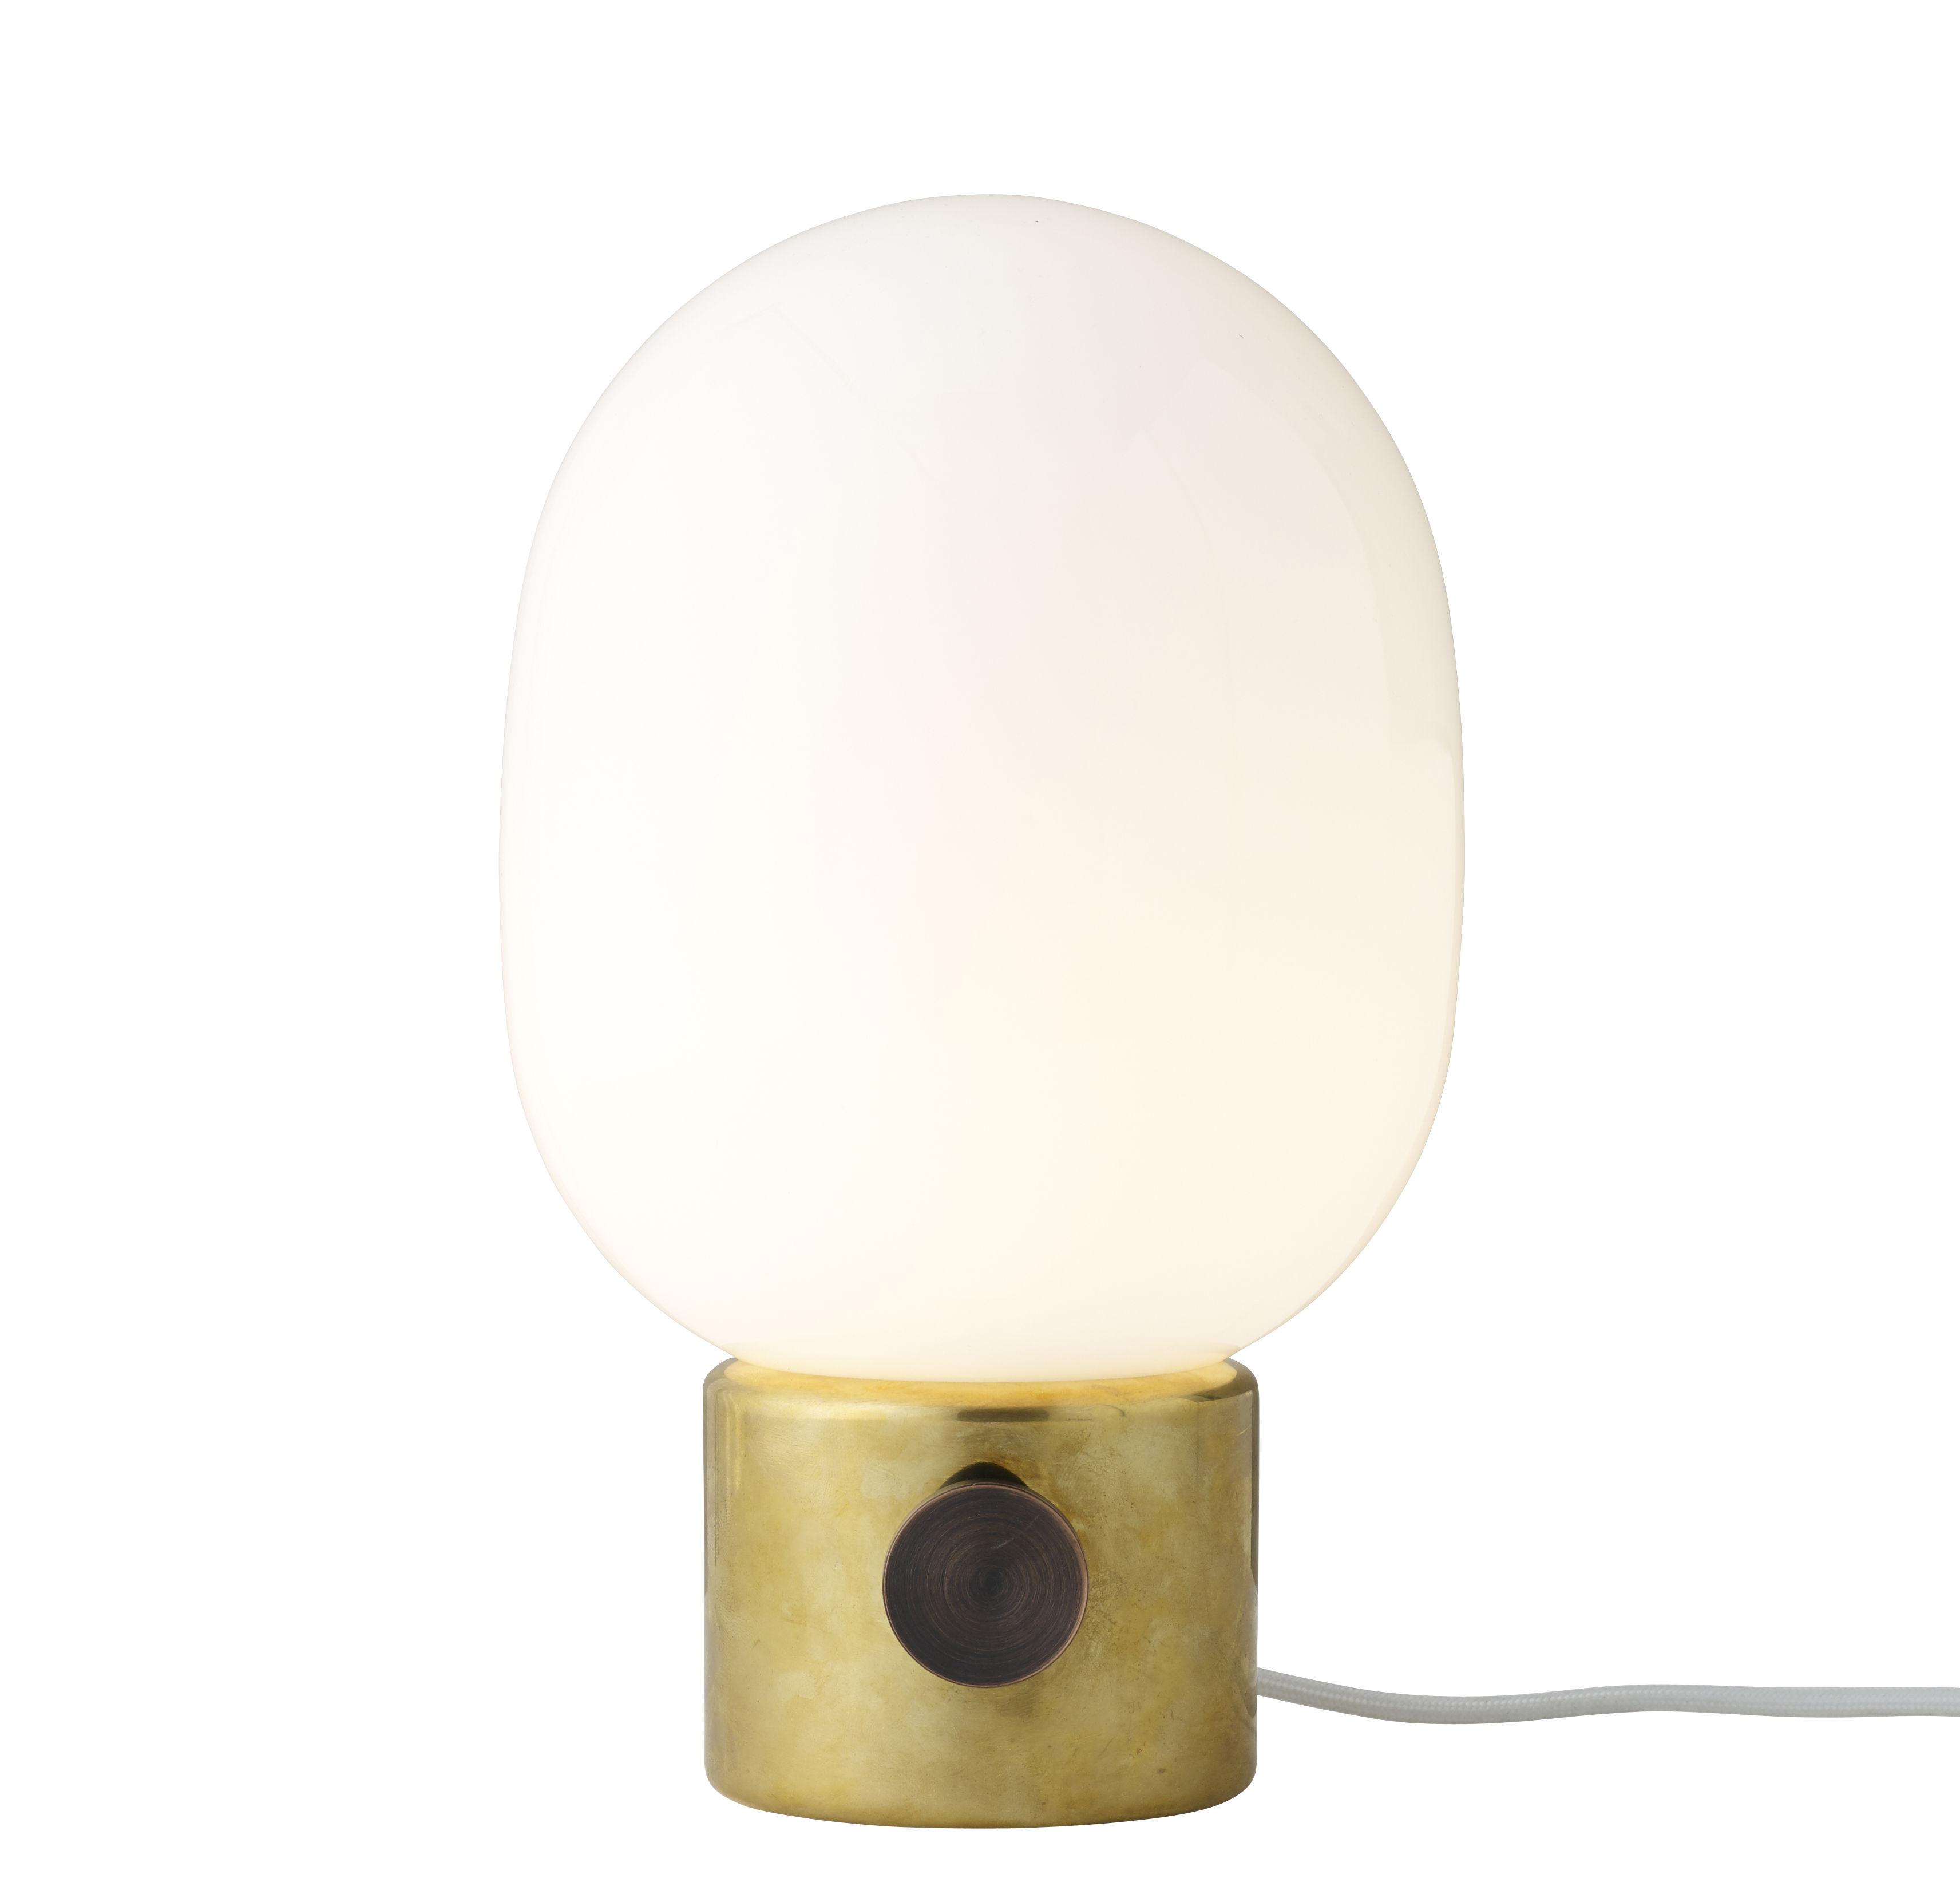 Lighting - Table Lamps - JWDA Table lamp - Metal by Menu - Mirror polished brass / Black - Brass, Glass